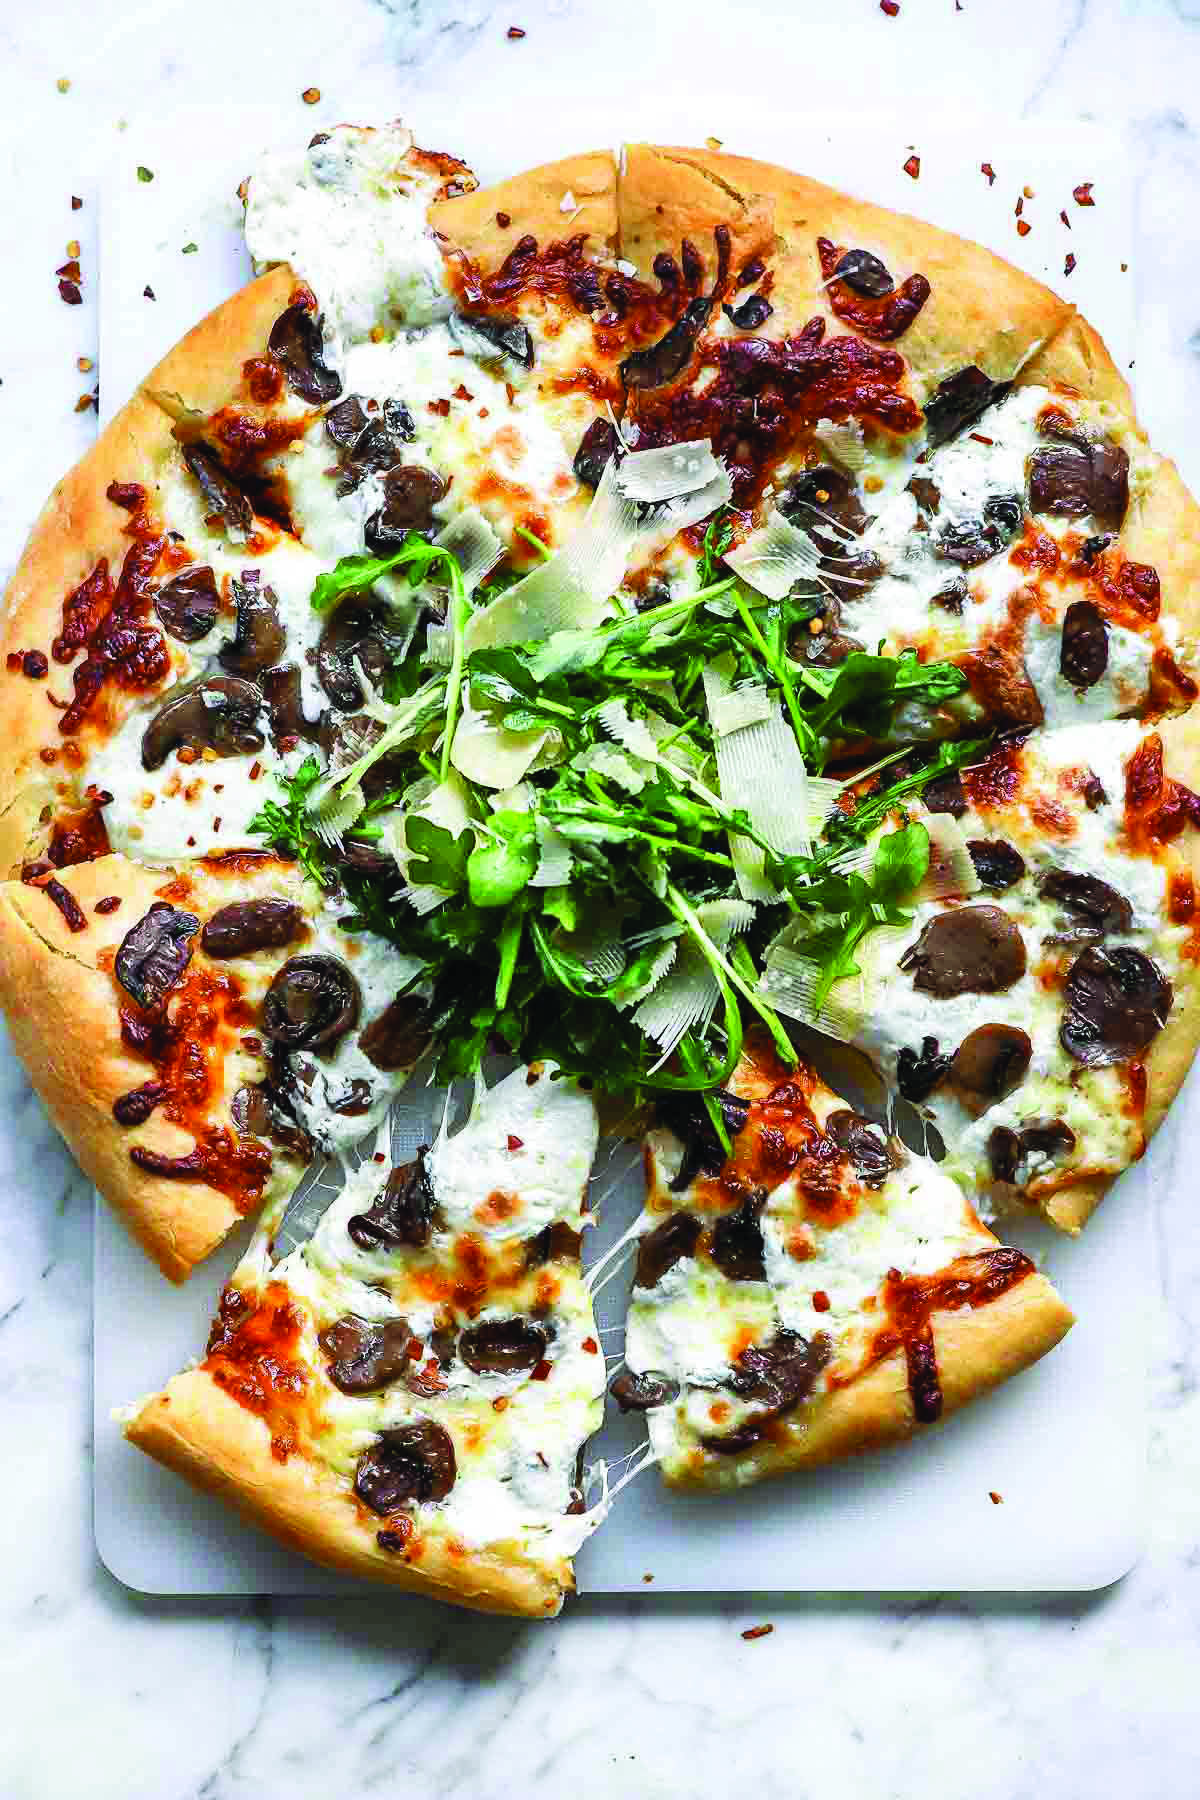 Miracle Pizza Dough Recipe Mushroom Pizza Recipes Pizza Recipes